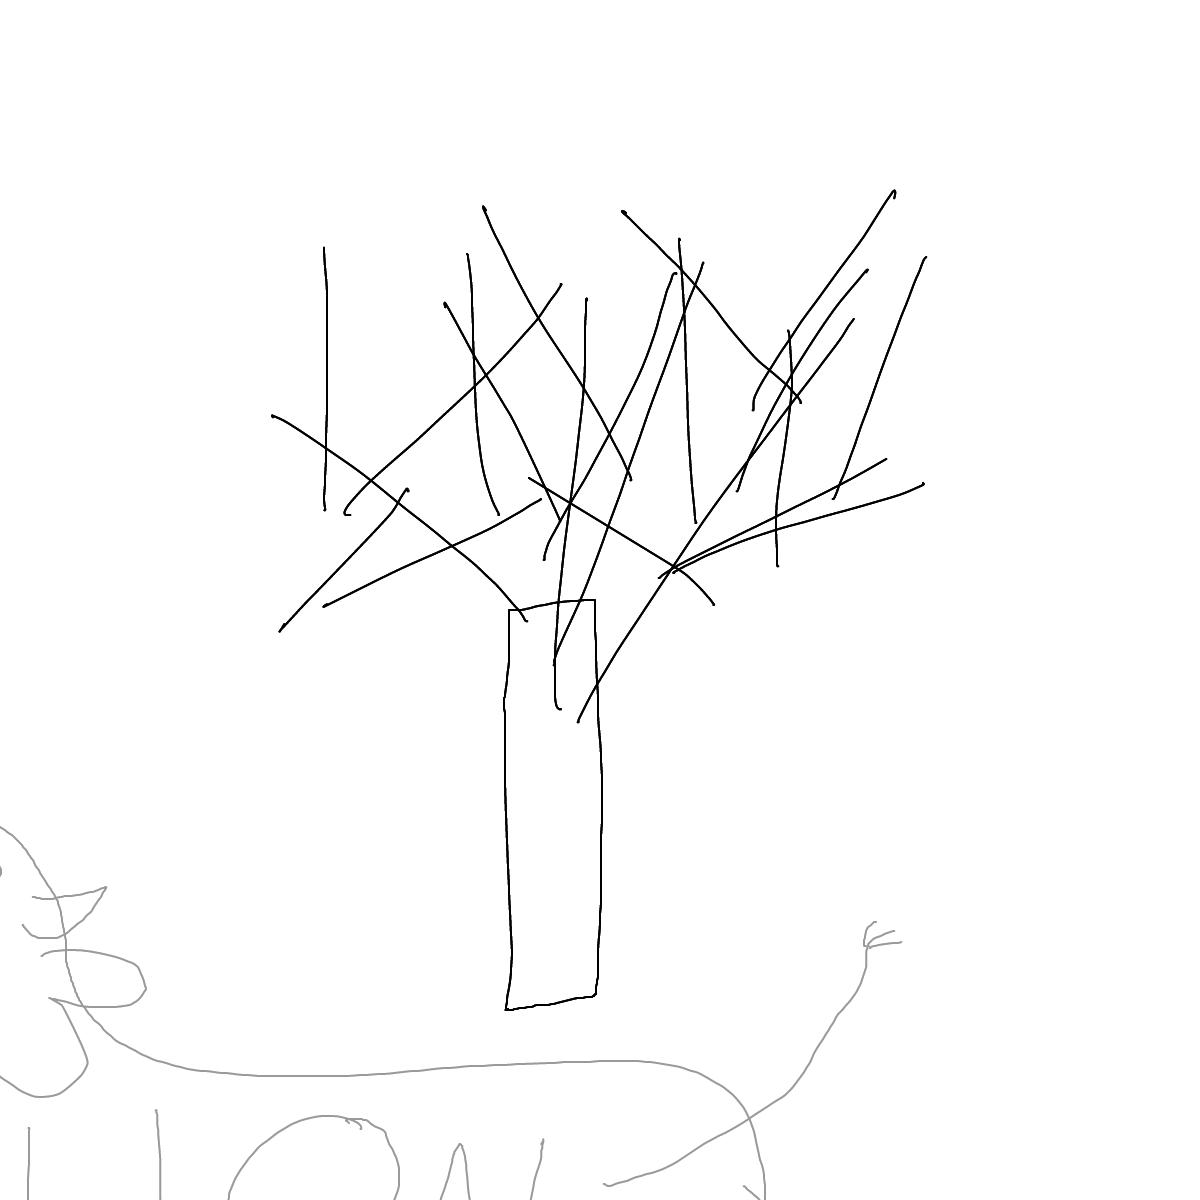 BAAAM drawing#2150 lat:52.4750328063964840lng: 13.4069023132324220